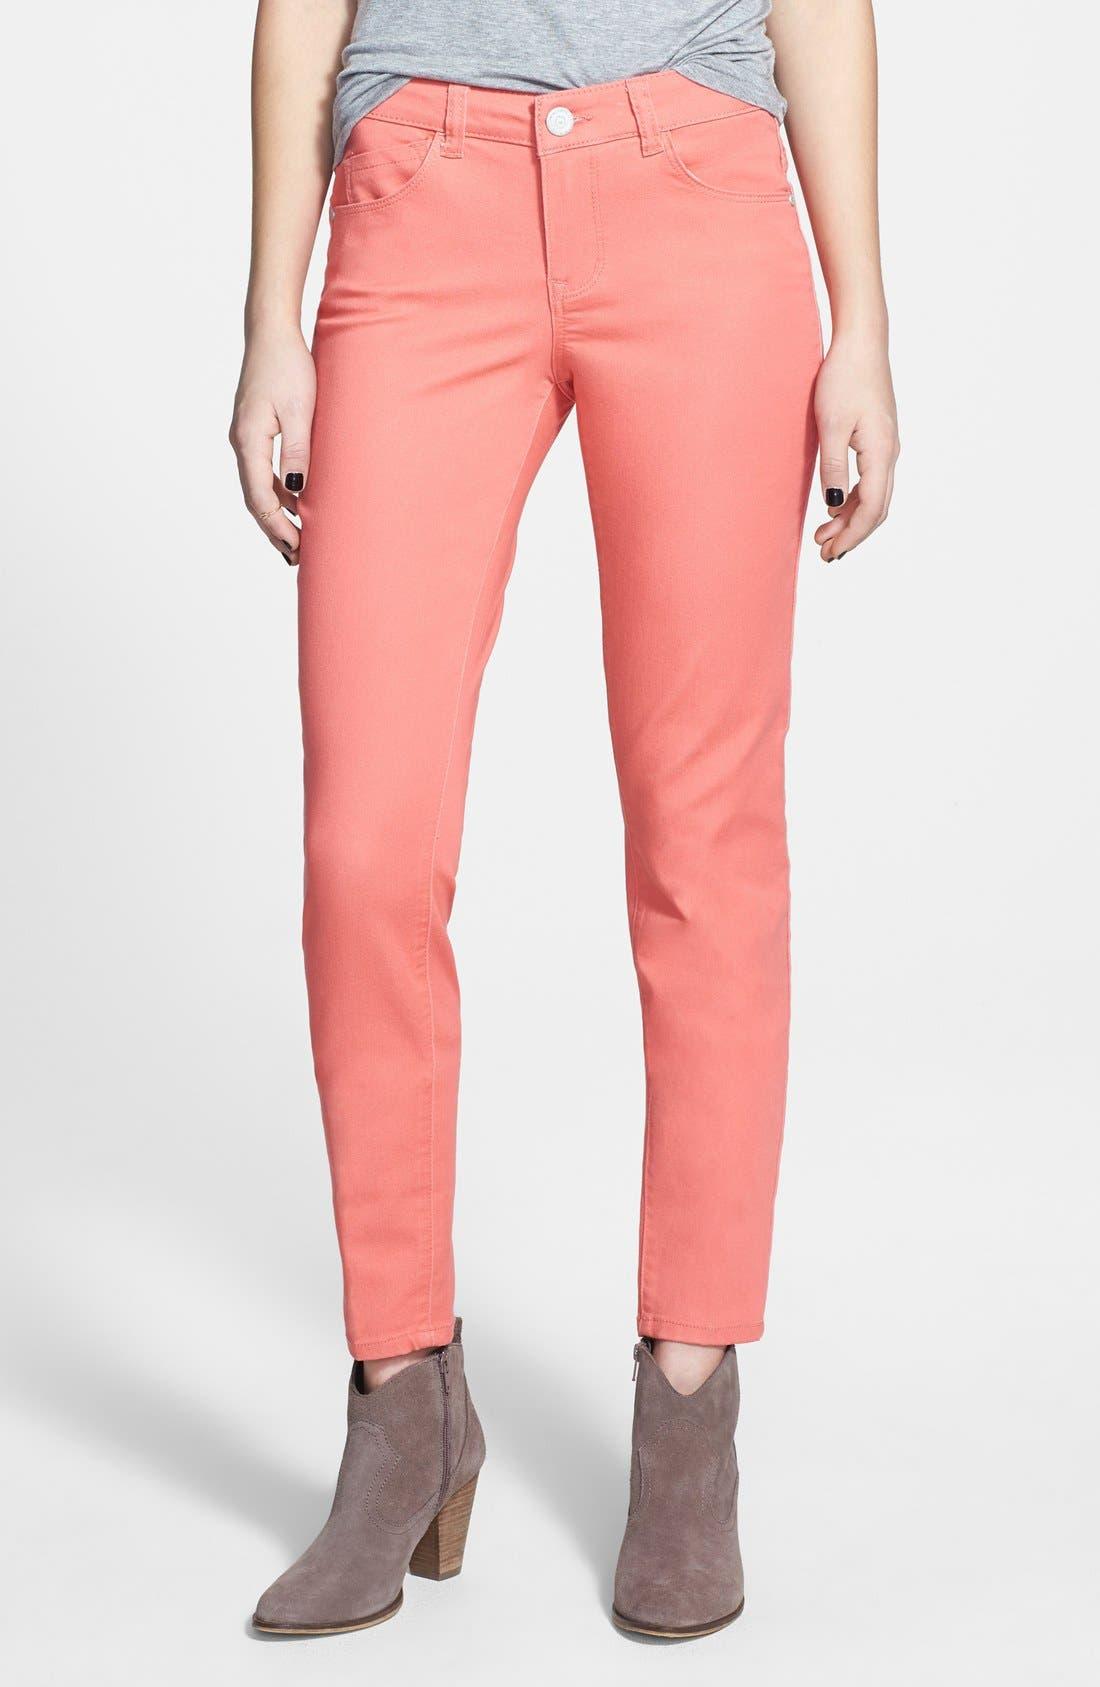 Jolt Colored Skinny Jeans